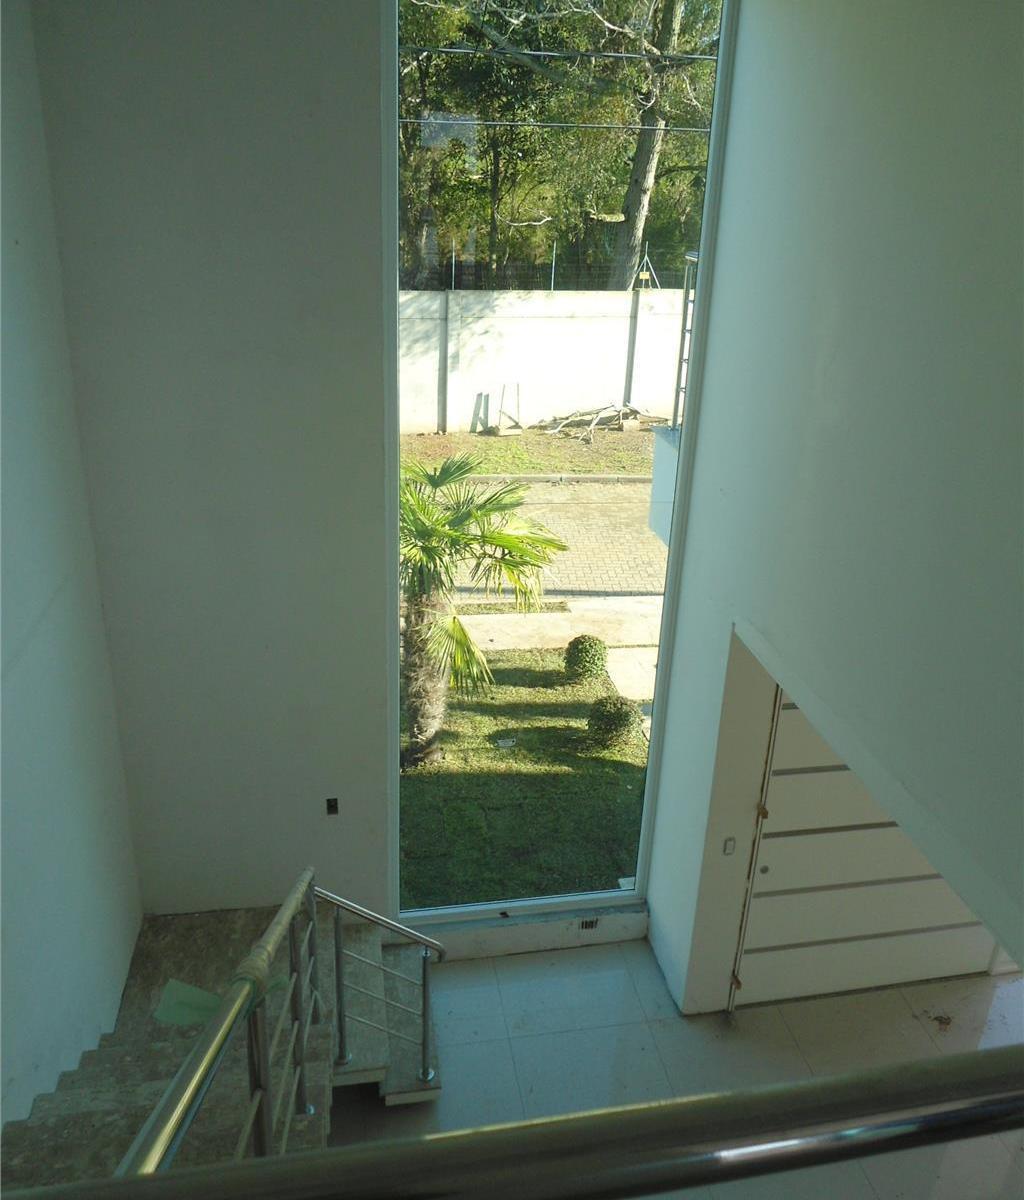 Imagens de #819932  Porto Alegre R$ 990.000 393 m2 ID: 2923606351 Imovelweb 1024x1200 px 2724 Box Banheiro Porto Alegre